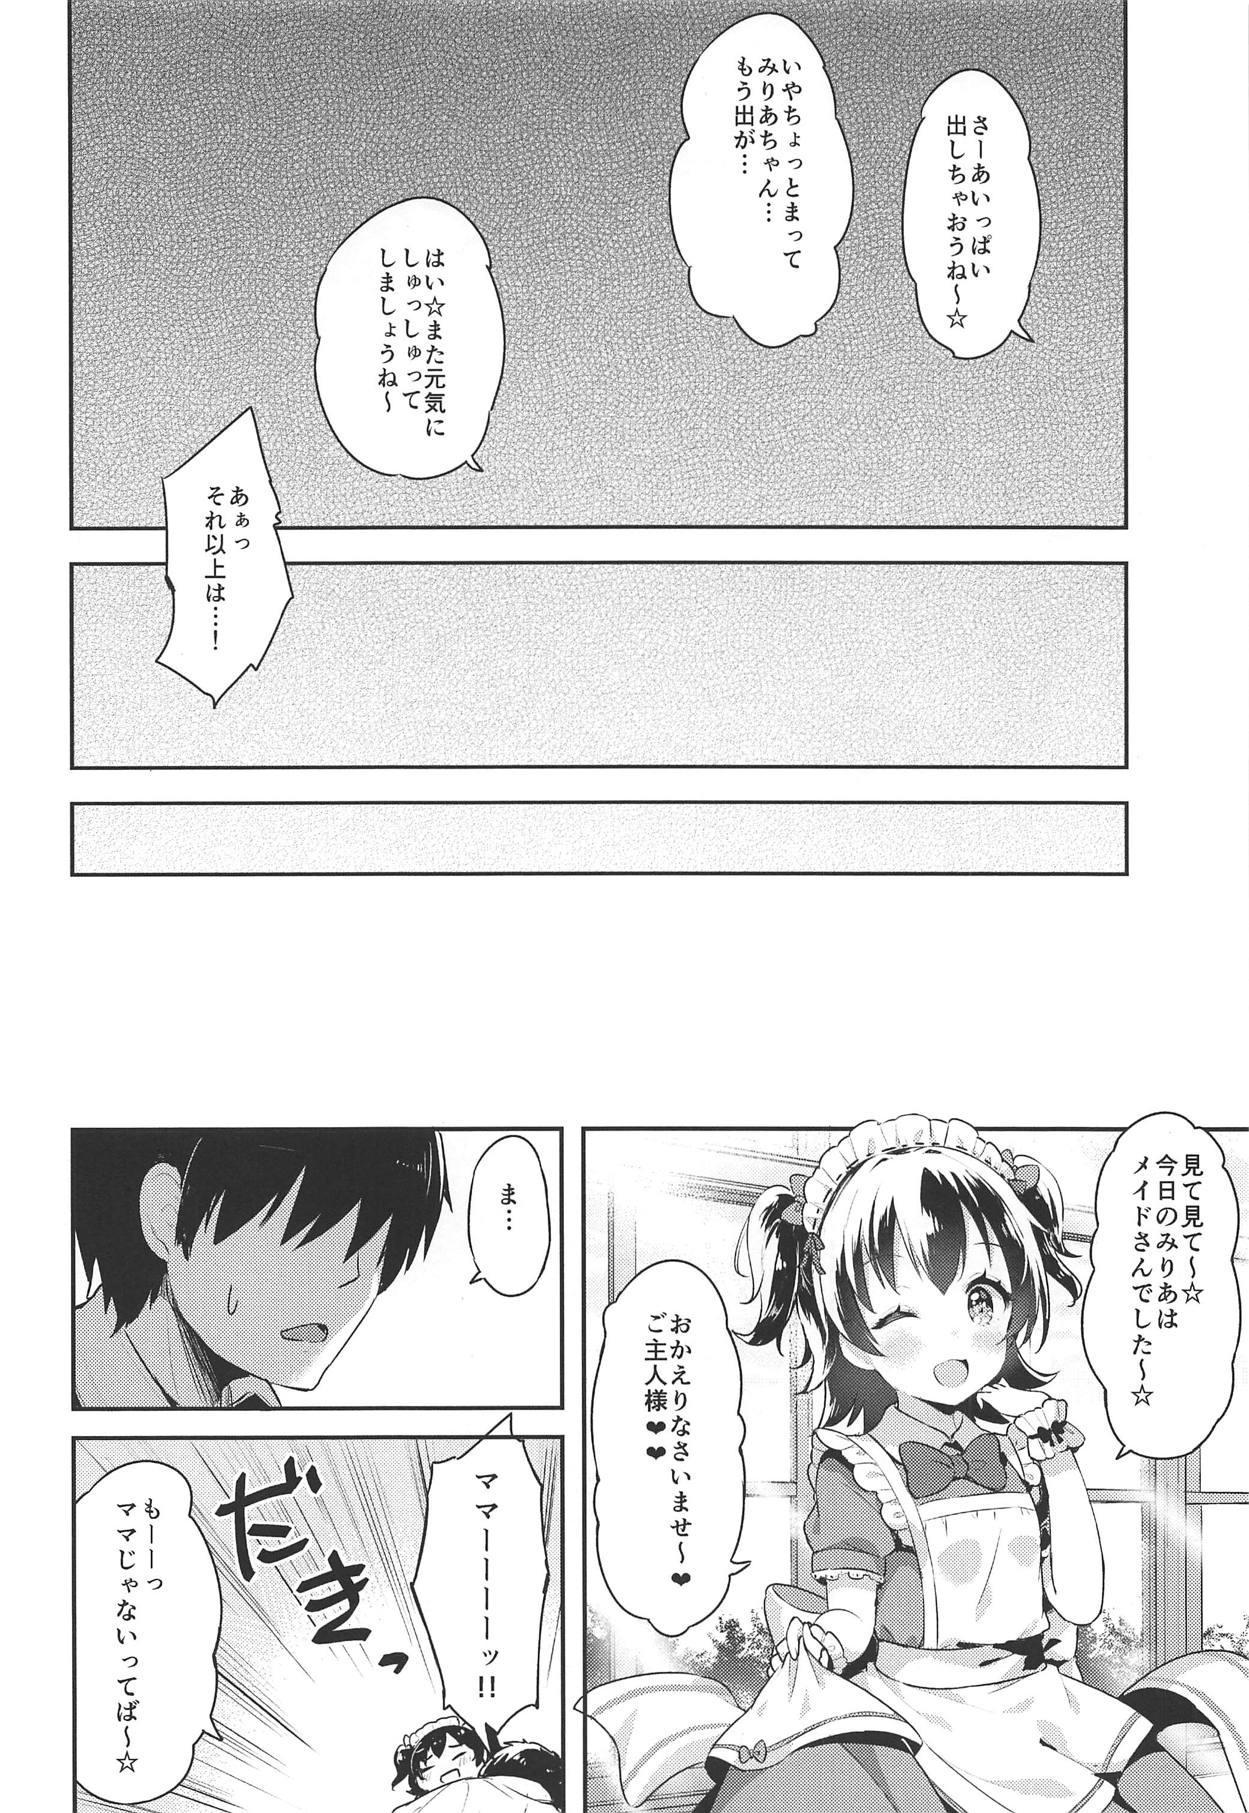 Miria-chan no Lolita Byoutou 18